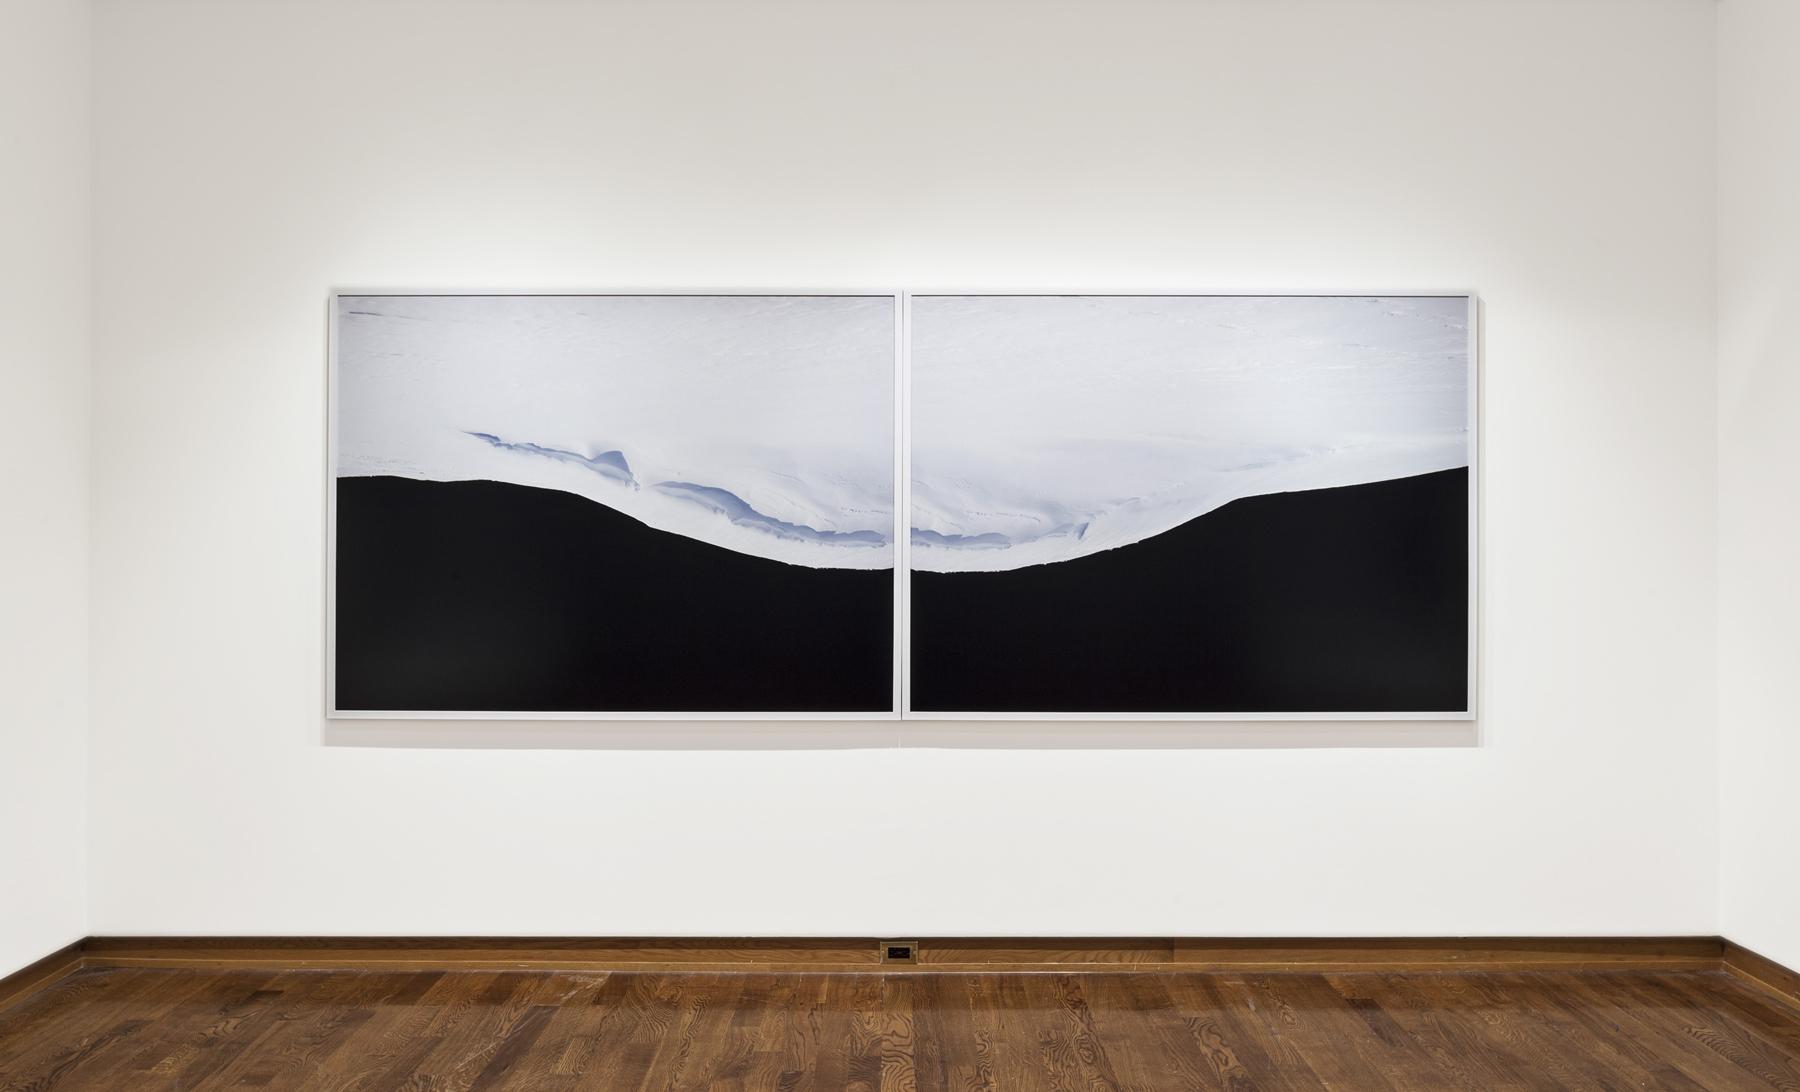 After Kurelek, (Diptych) 2013, 2 Digital Chromogenic Prints. Overall dimensions 50 x 134 inches. Photo credit: Toni Hafkenscheid.